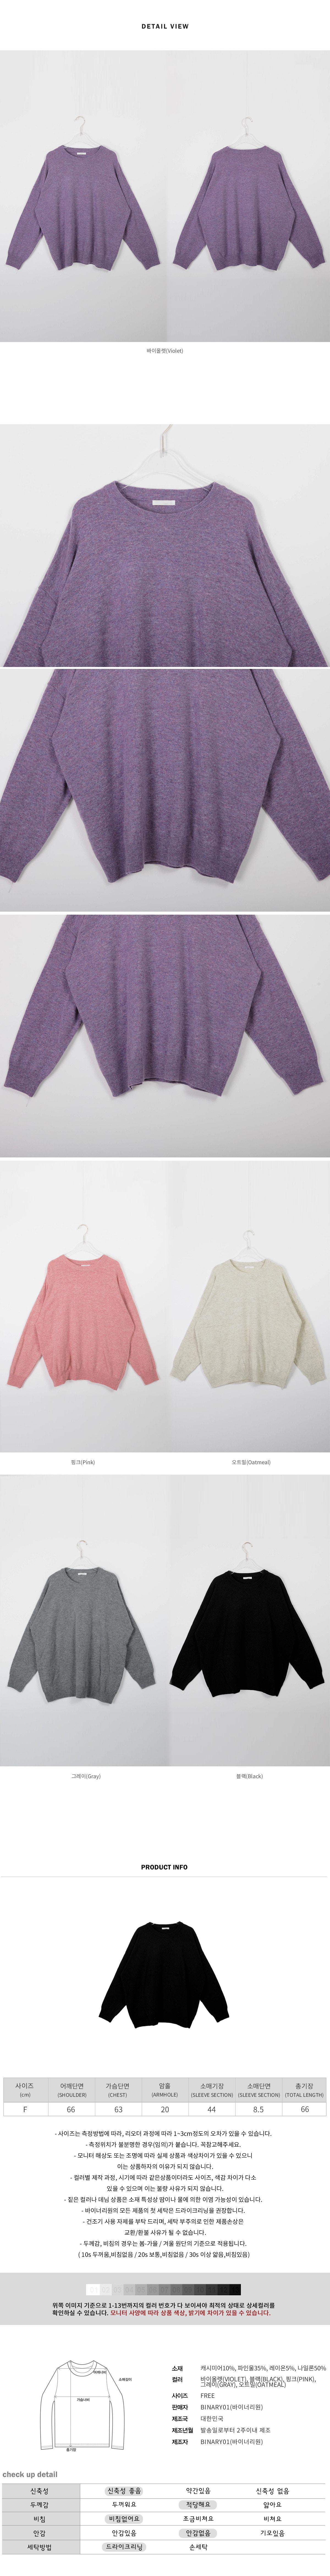 Cashmere newthing knit